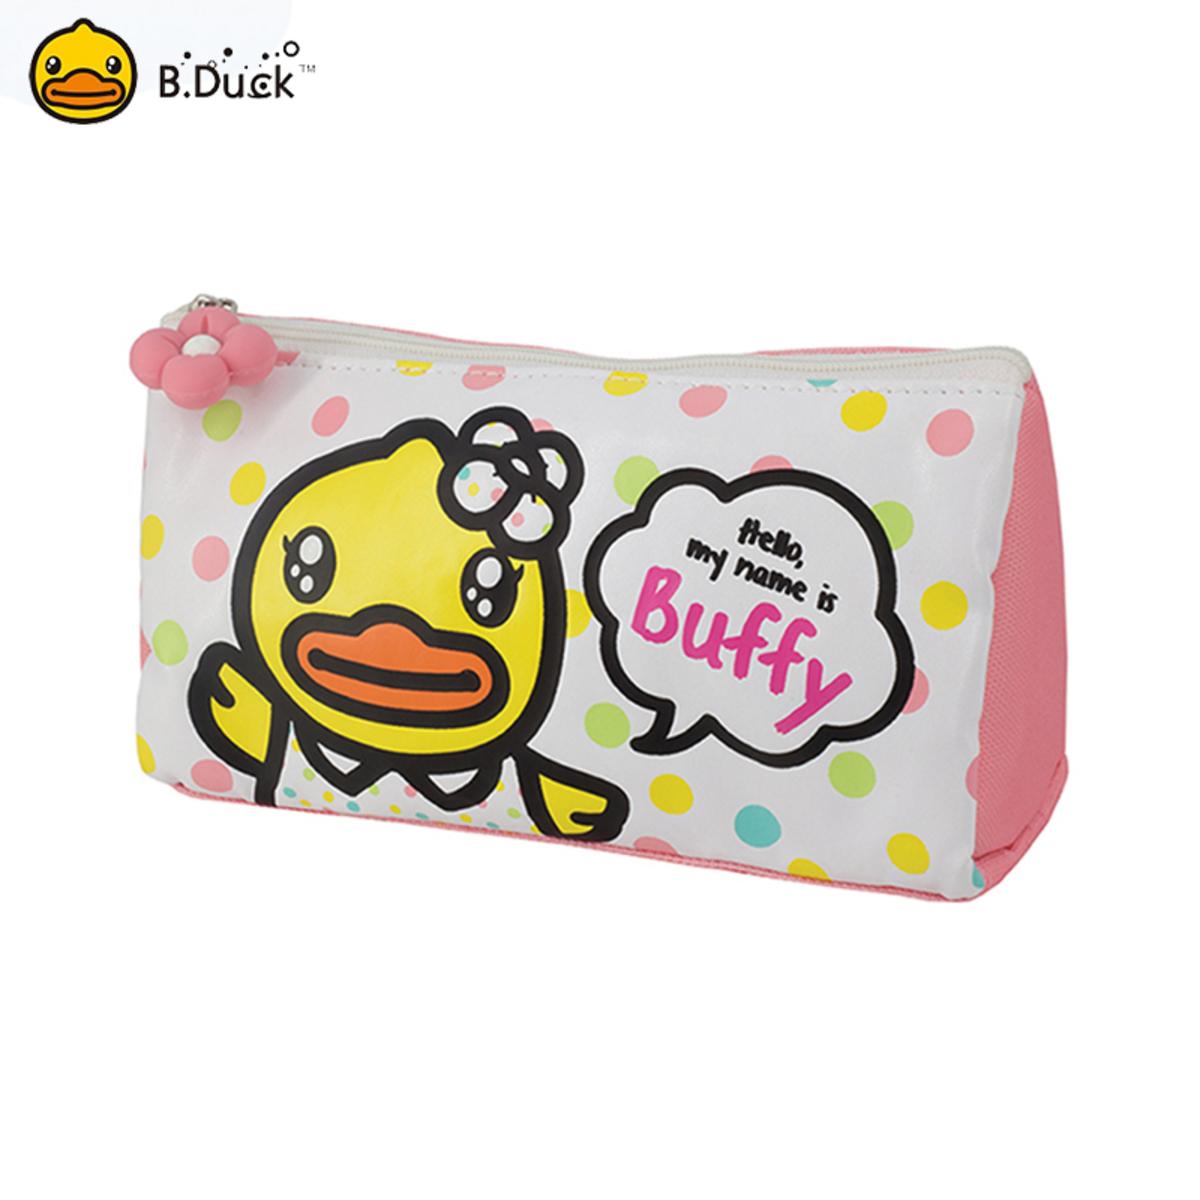 B.Duck Buffy 小鴨妹妹多功能袋 Multi-function Bag